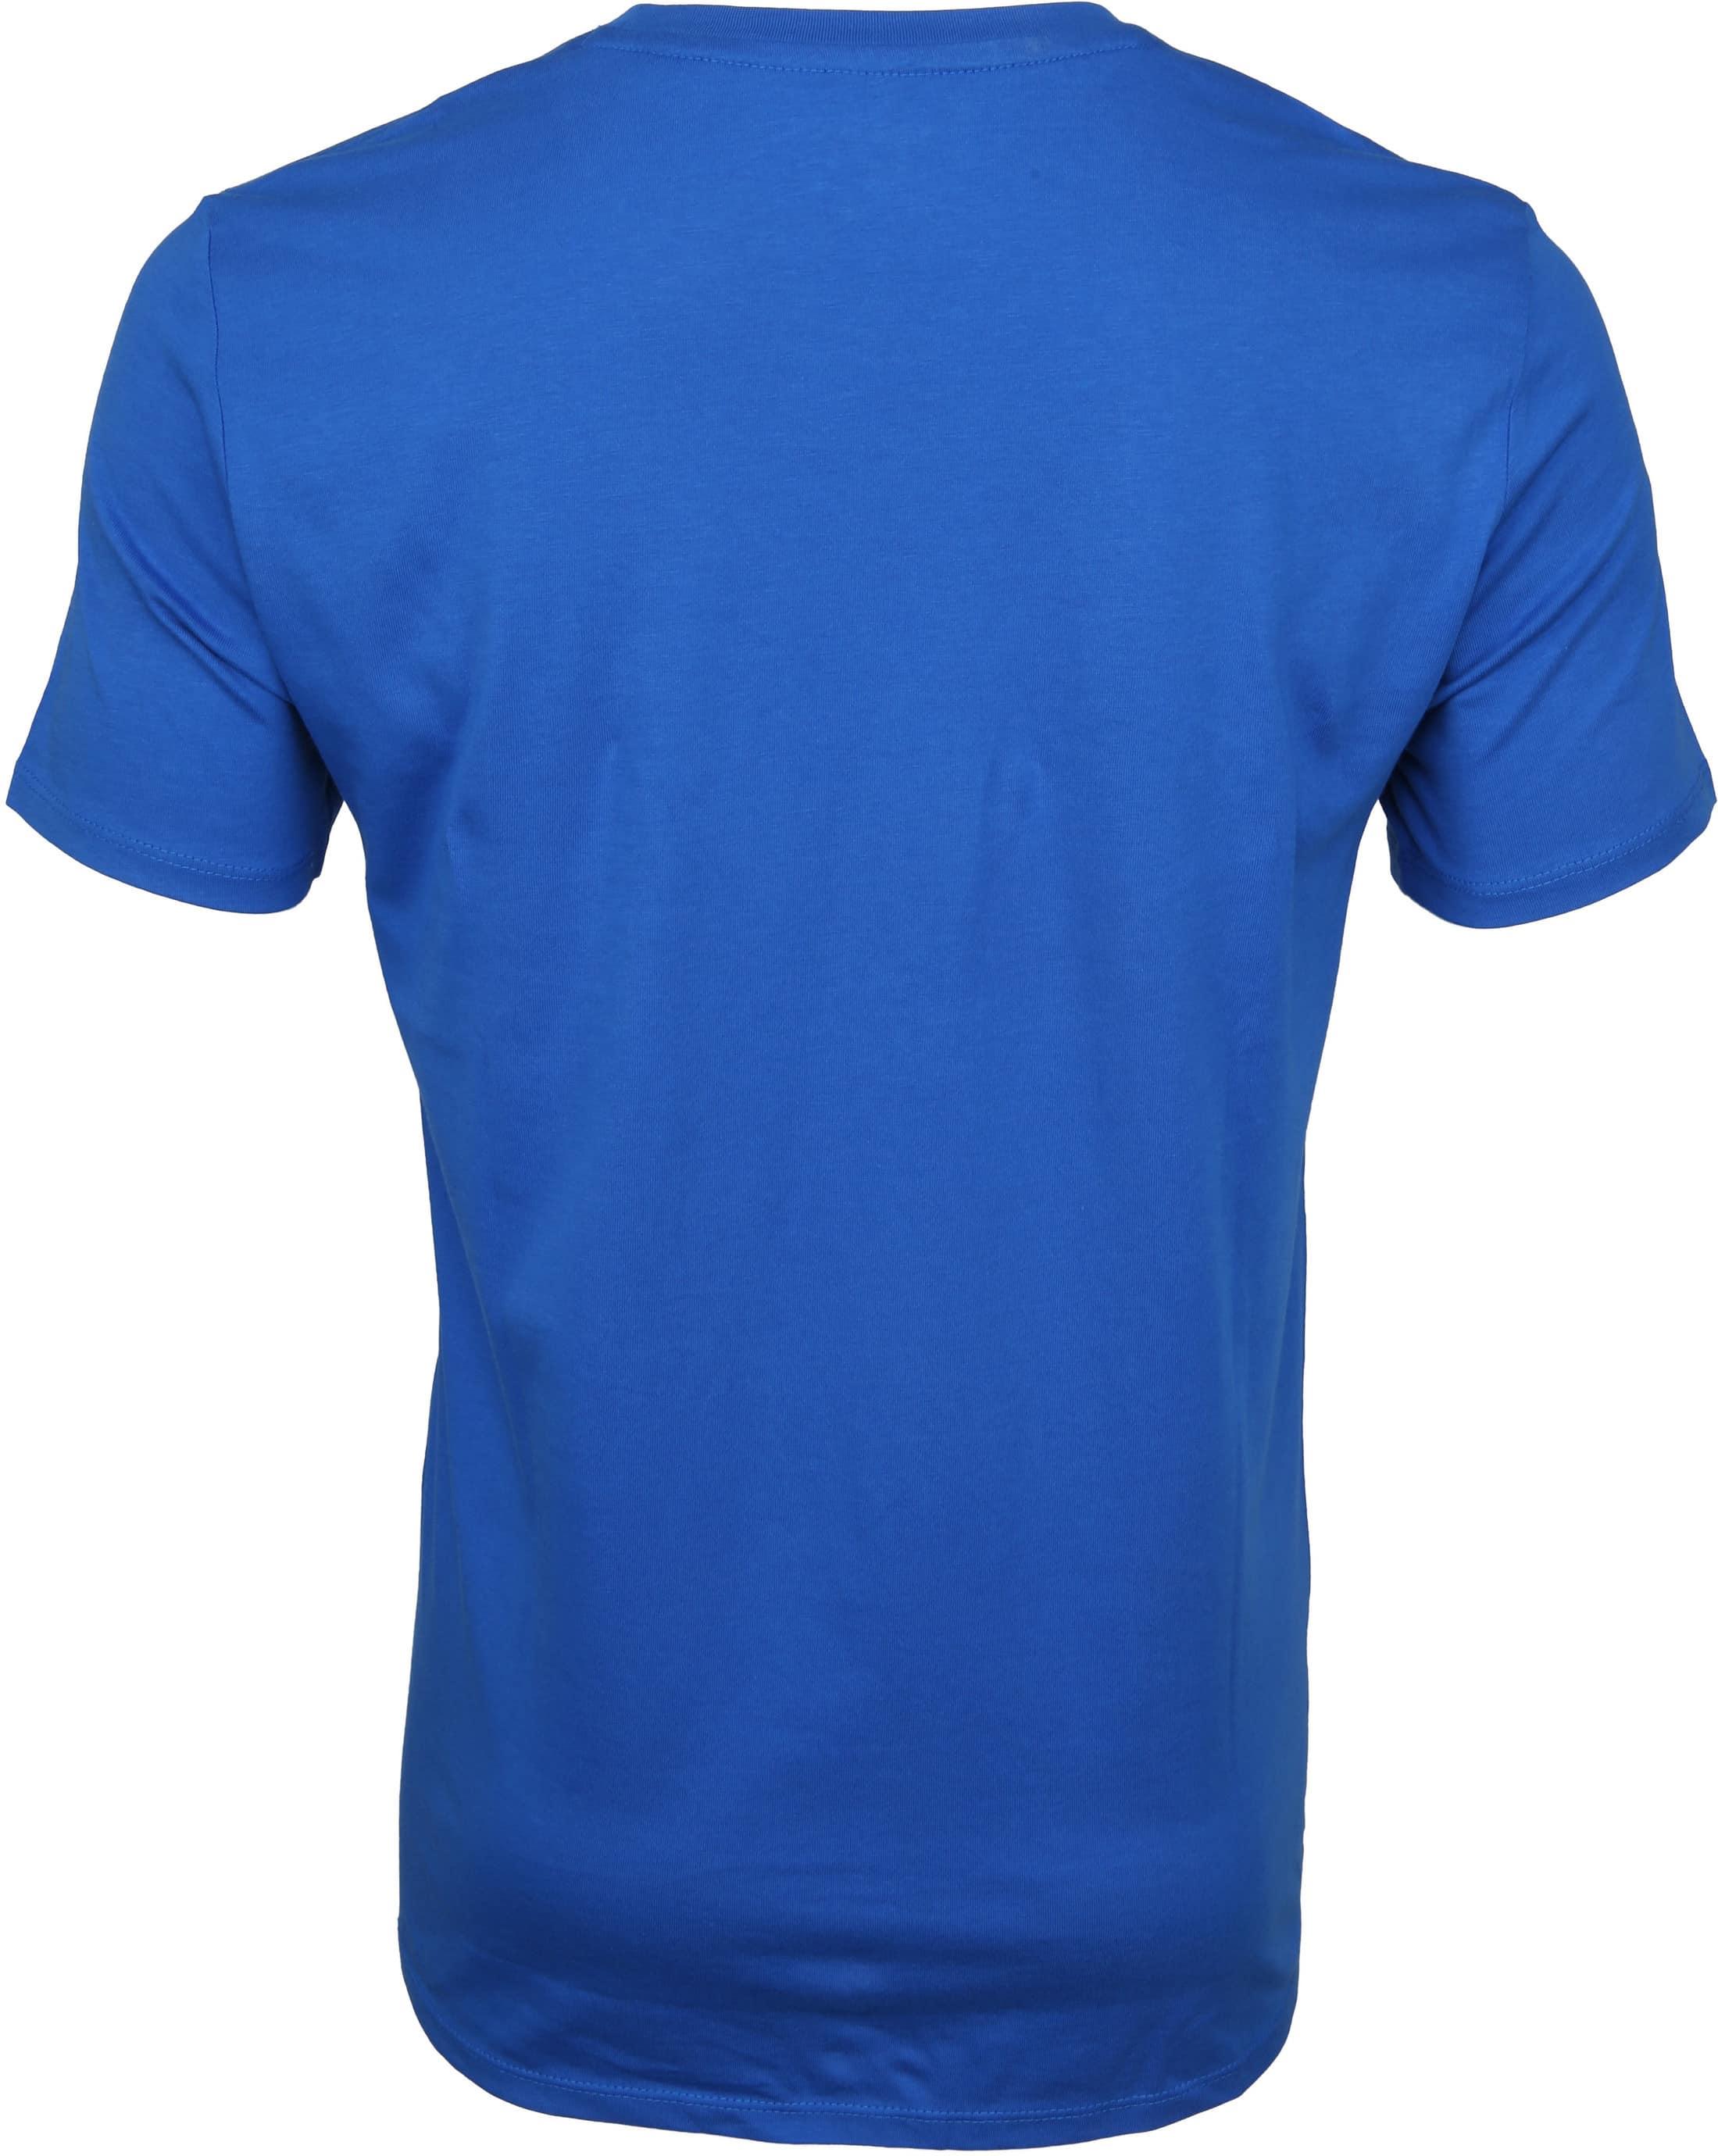 Marc O'Polo T-Shirt Victoria Blue foto 2